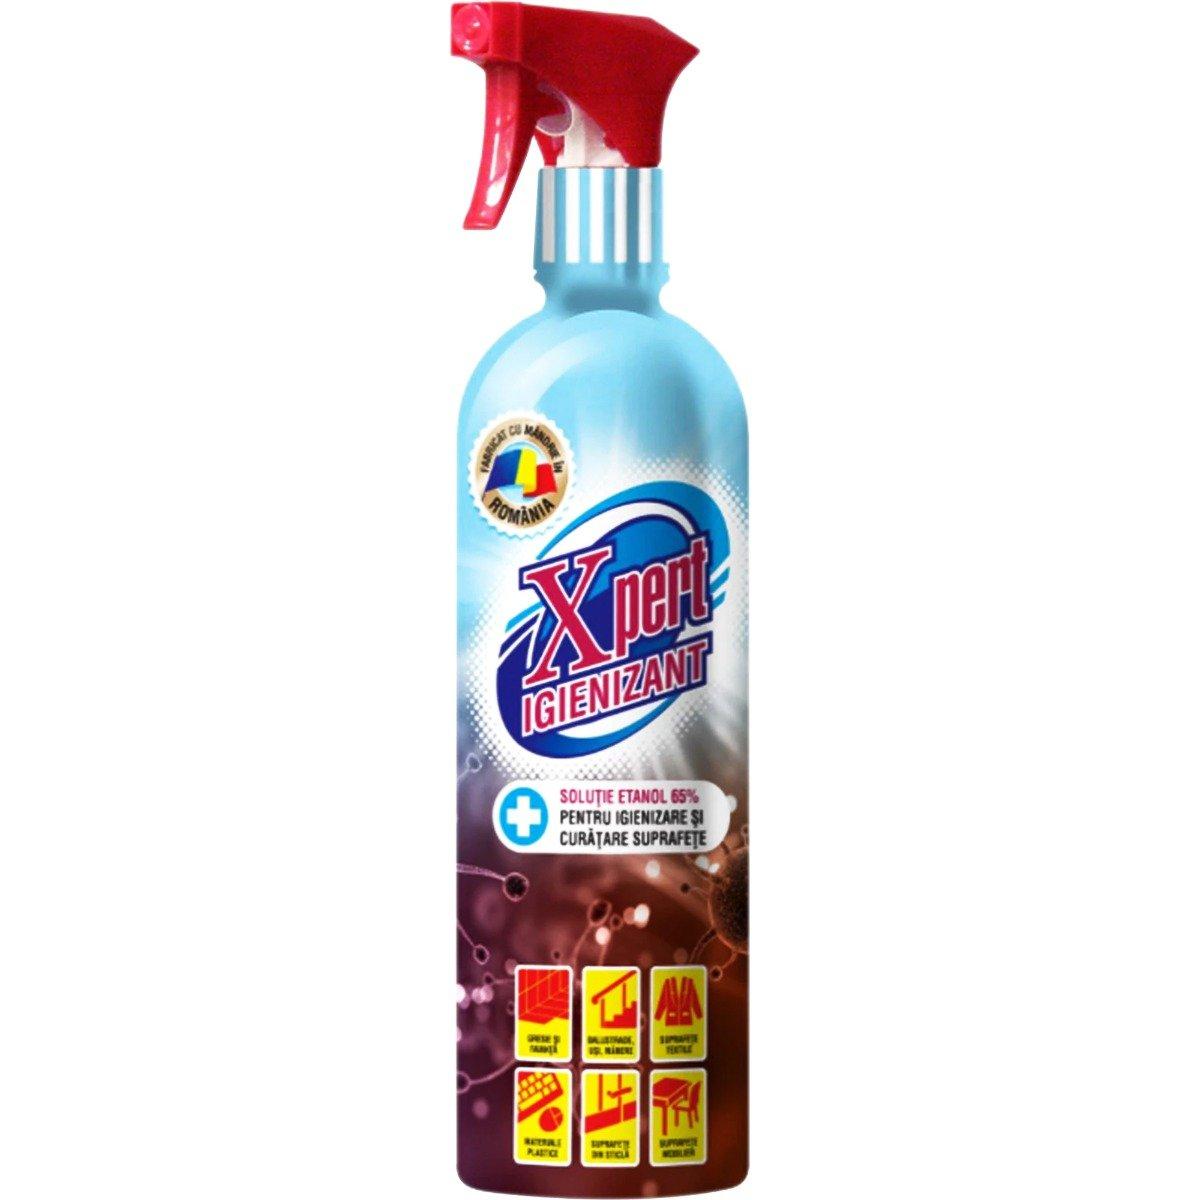 Spray dezinfectant pentru suprafete Xpert Care, 750 ml imagine